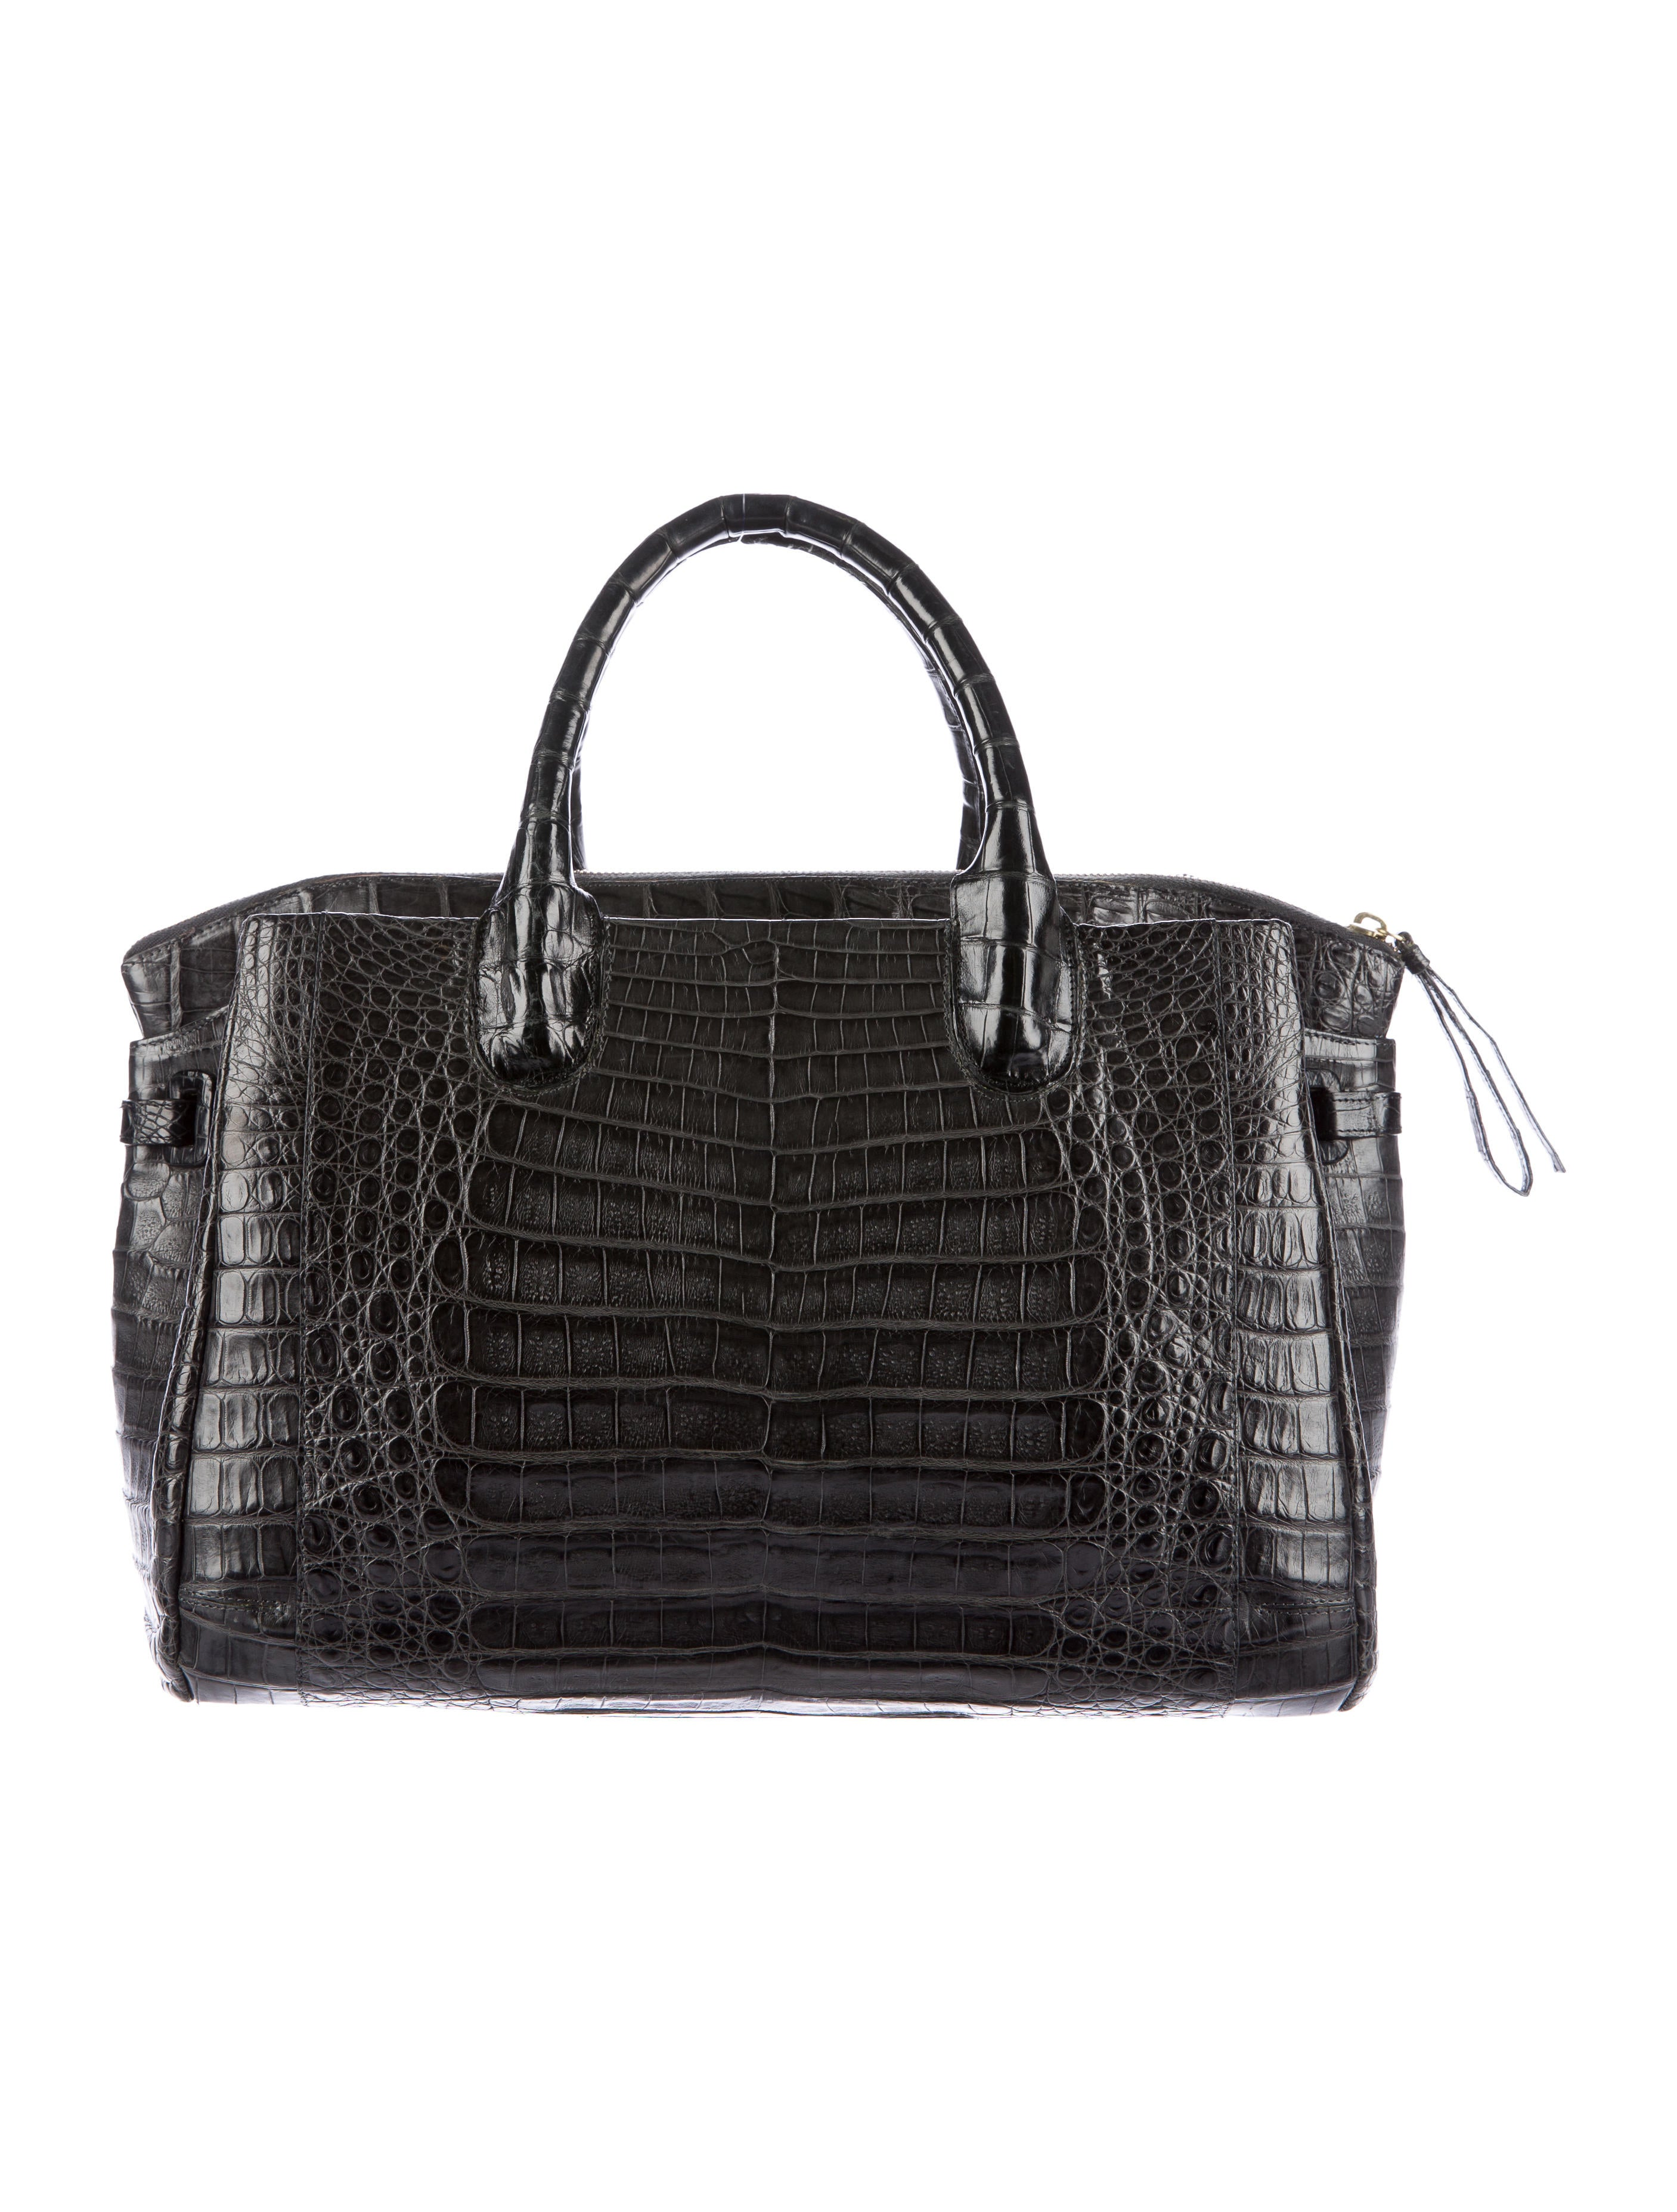 Nancy gonzalez crocodile top handle tote handbags for Nancy gonzalez crocodile tote